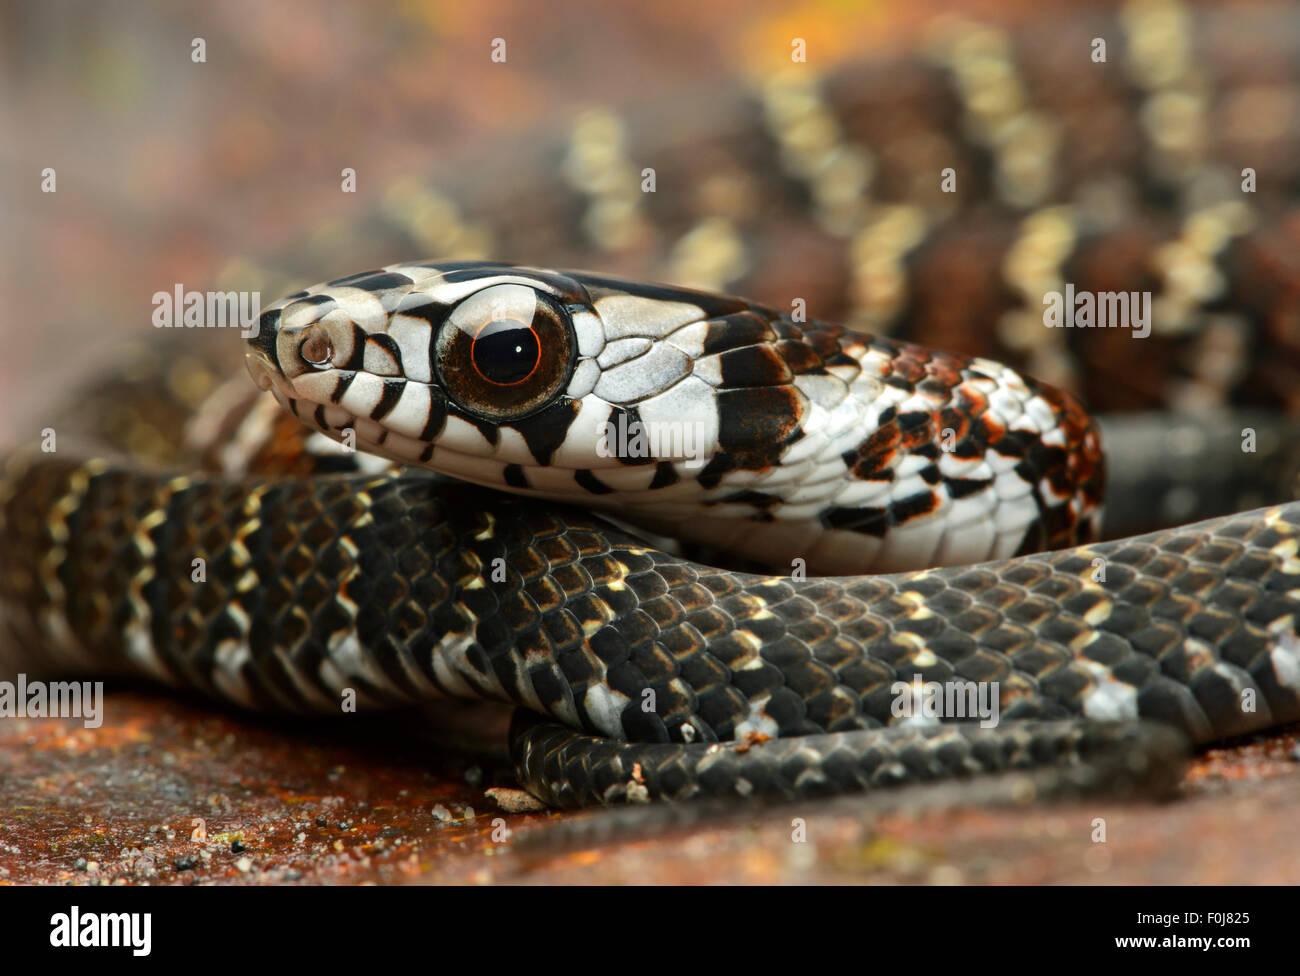 Forêt fauve Racer (Dendrophidion dendrophis), snake (Colubridae), Amazon rainforest, Parc national Yasuni, Photo Stock